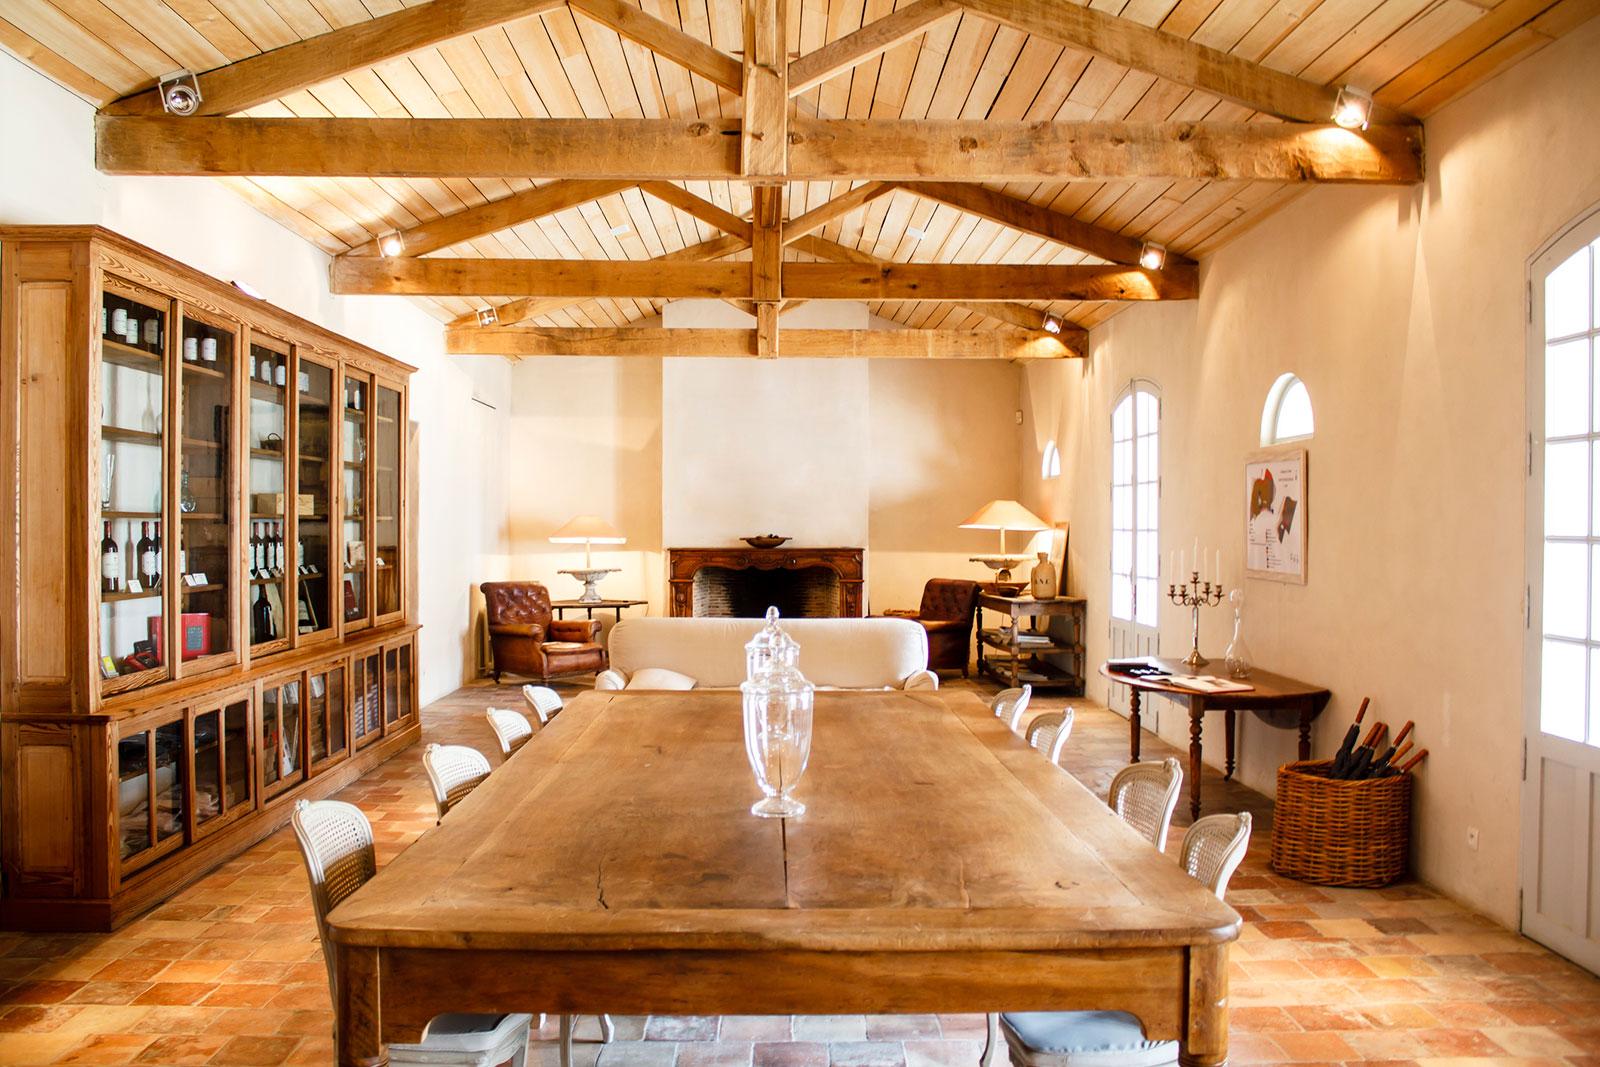 Antique Dining Room Sets Lovetoknow